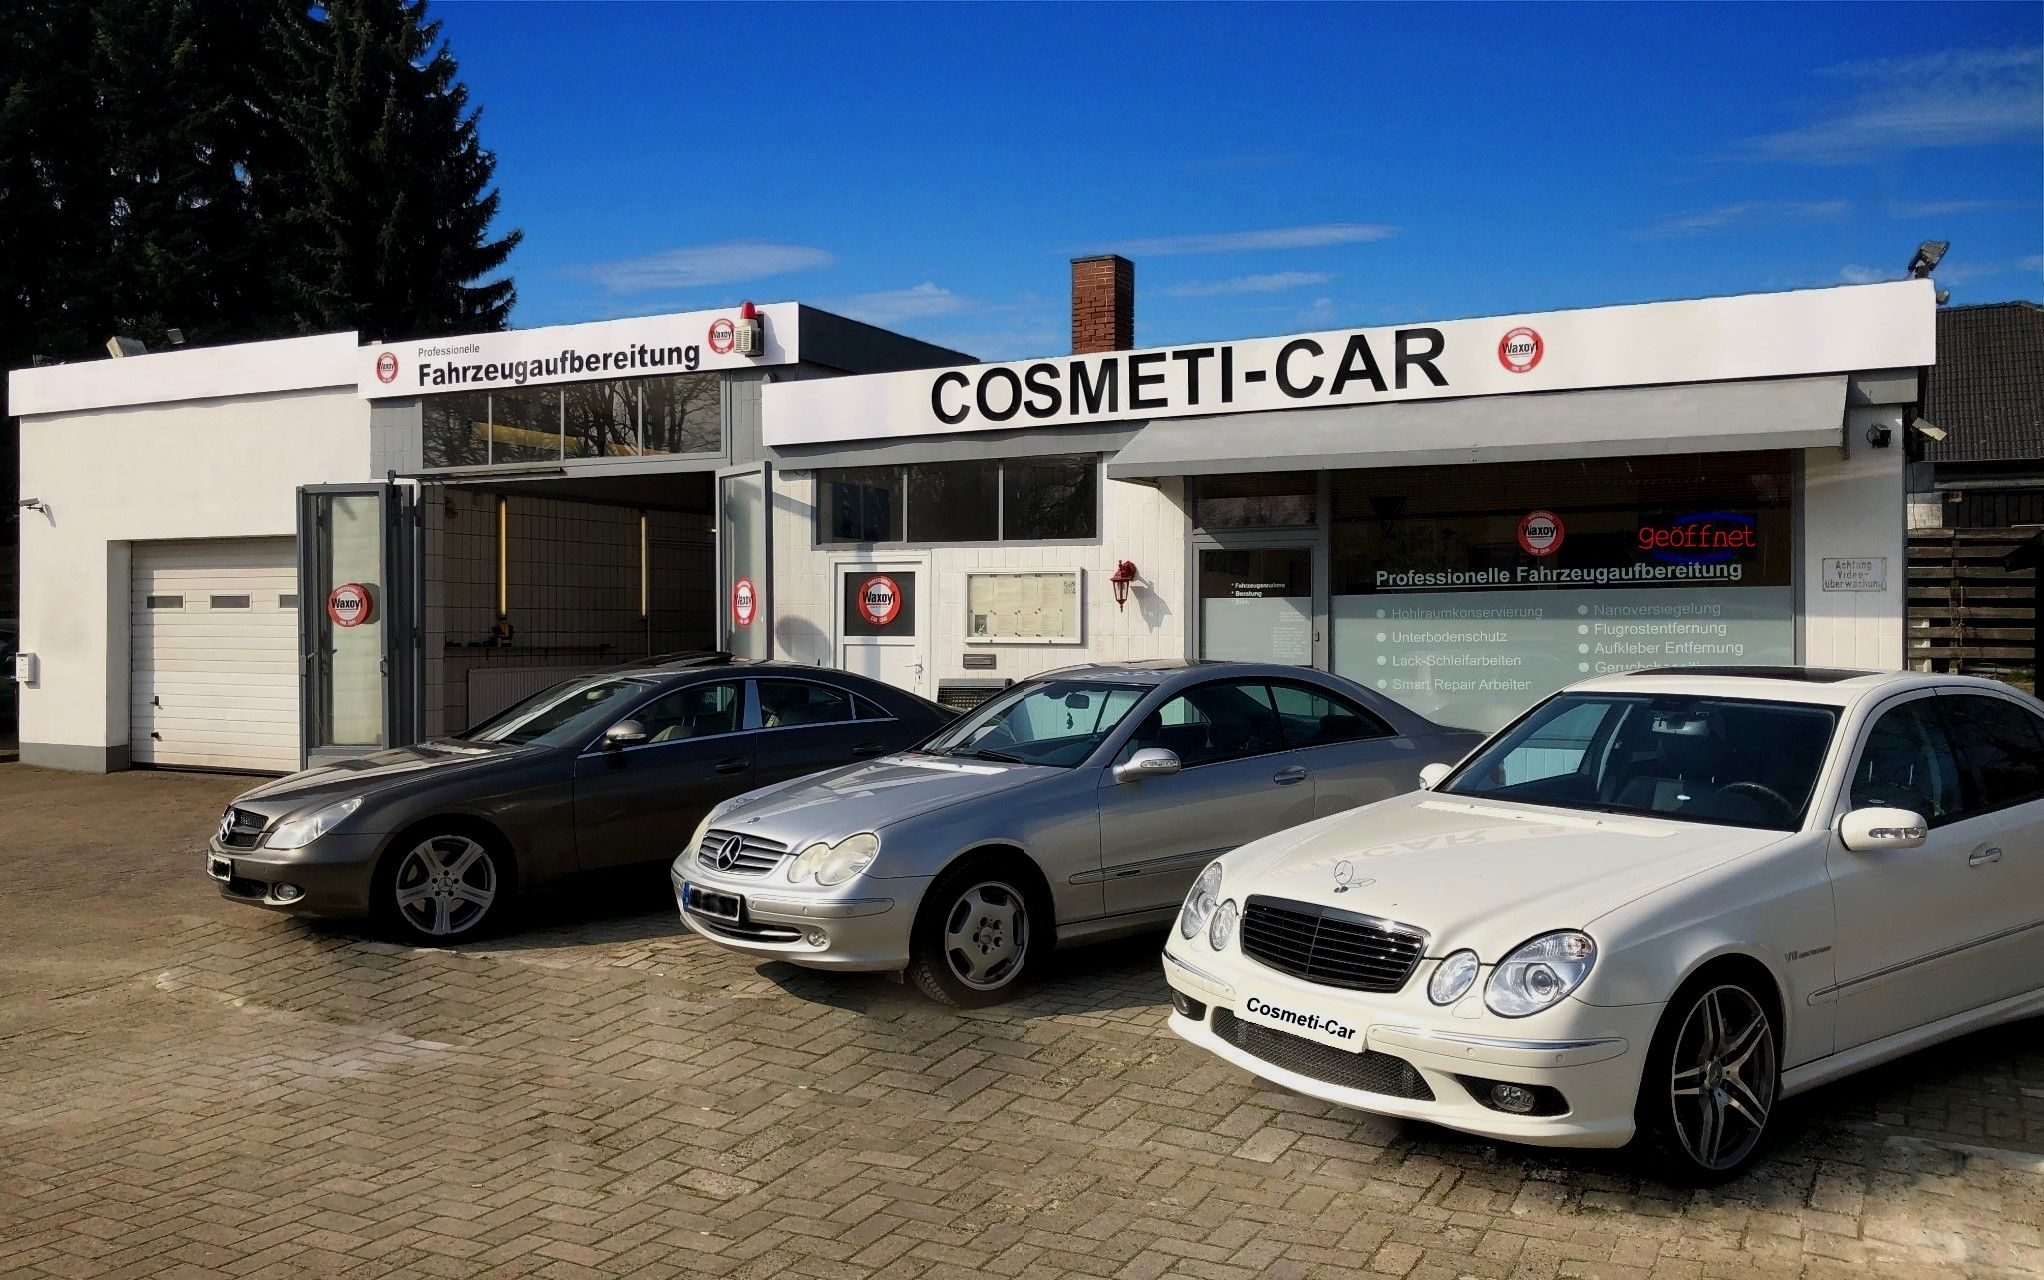 Cosmeti-Car